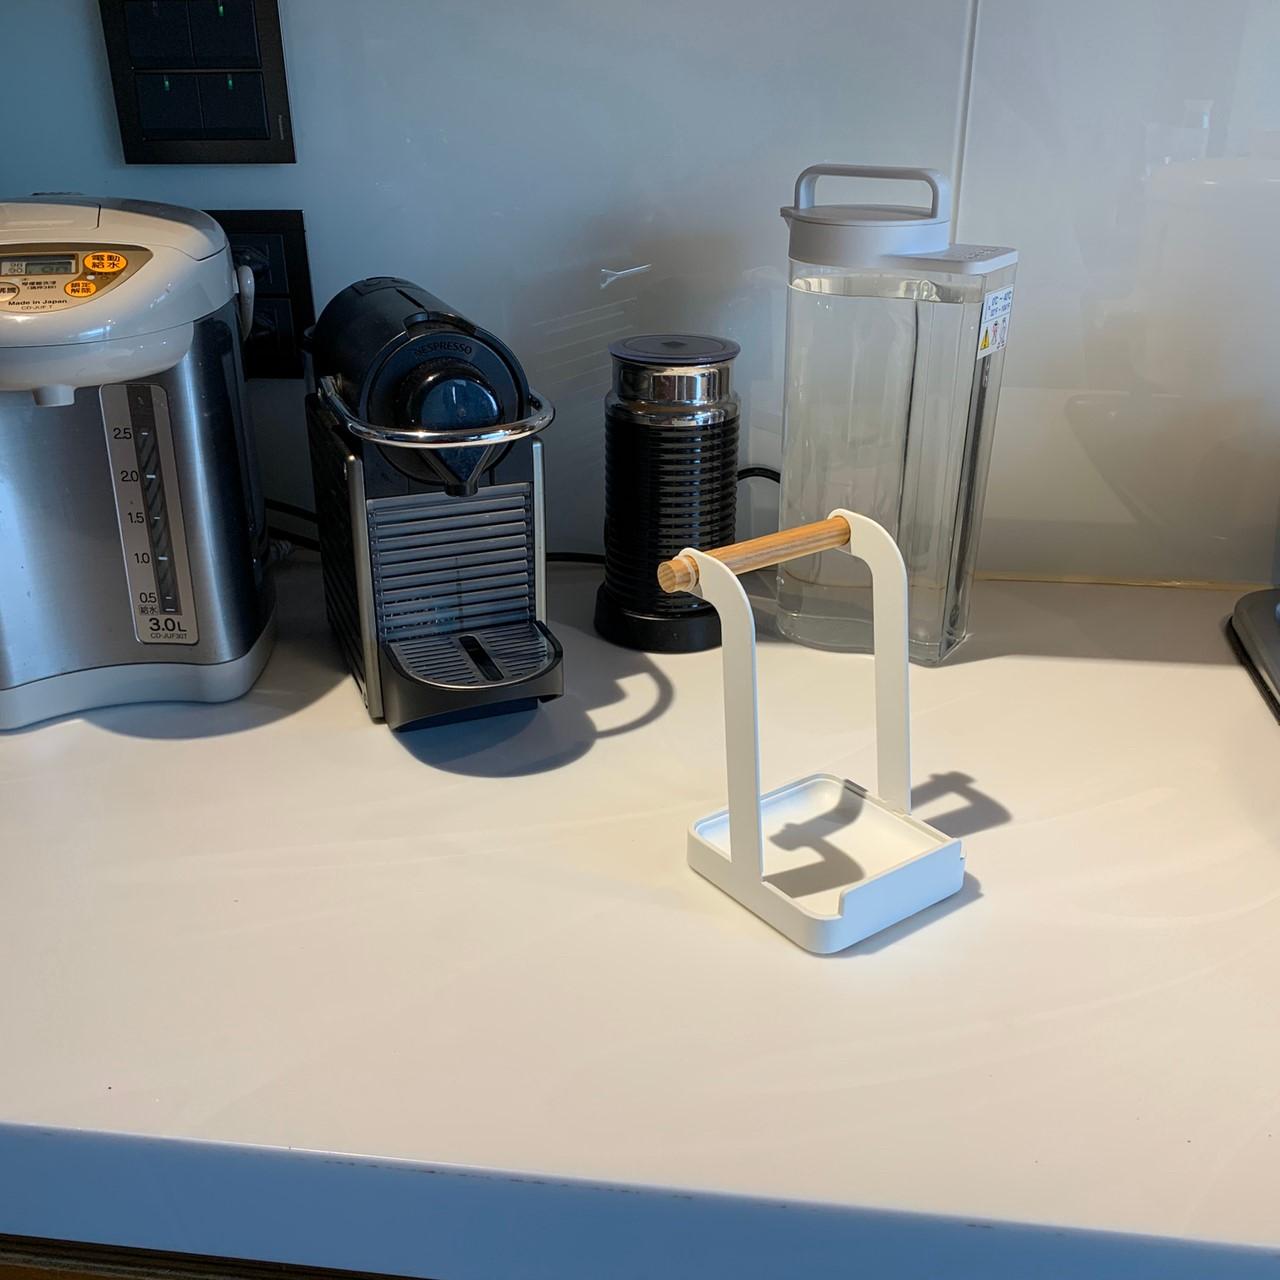 tosca多功能立式收納架 山崎收納 Yamazaki 廚房收納 鍋具收納 鍋蓋 食譜置物架